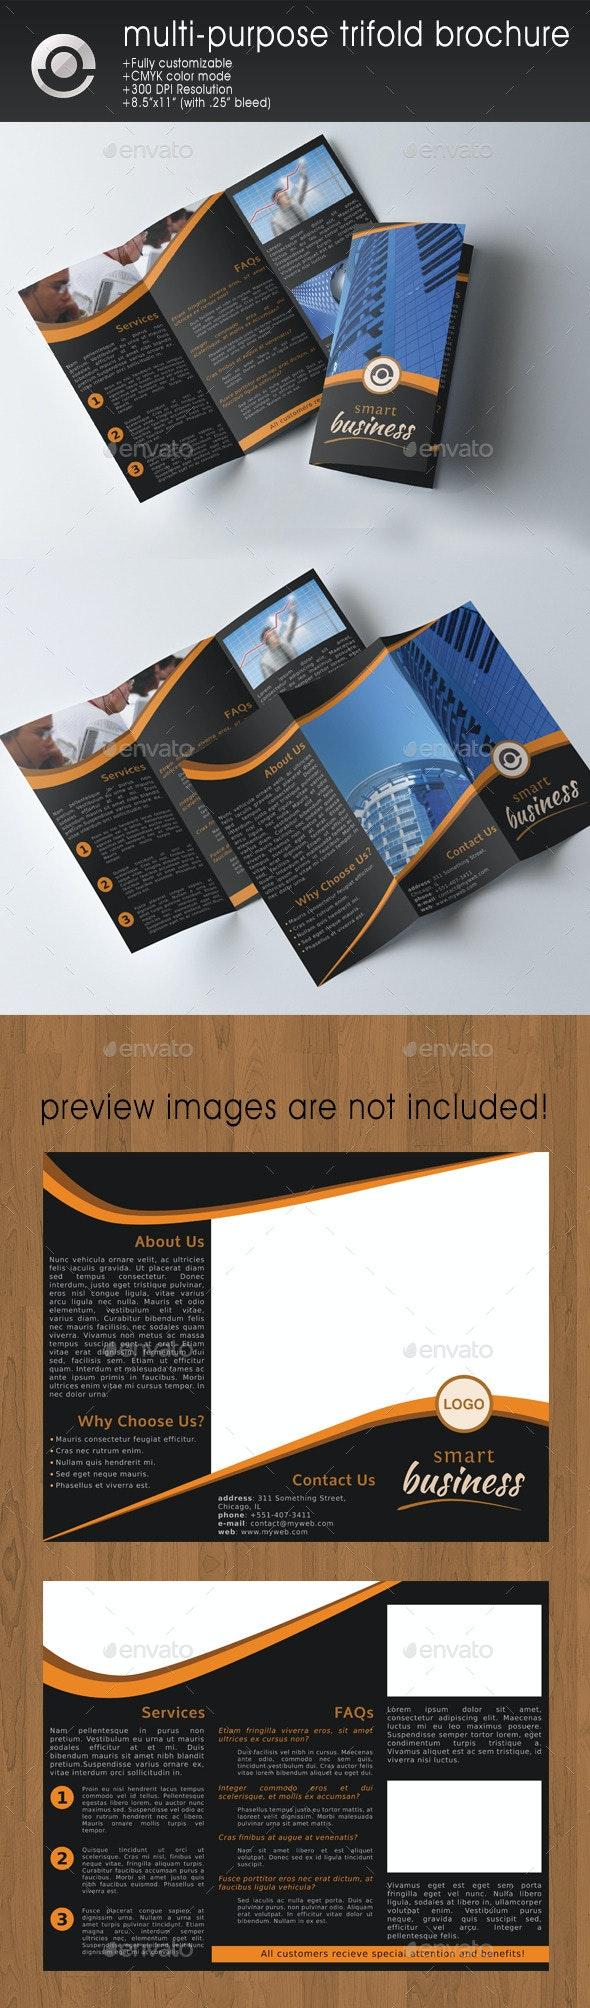 Multi-purpose Business Trifold Brochure - Corporate Brochures